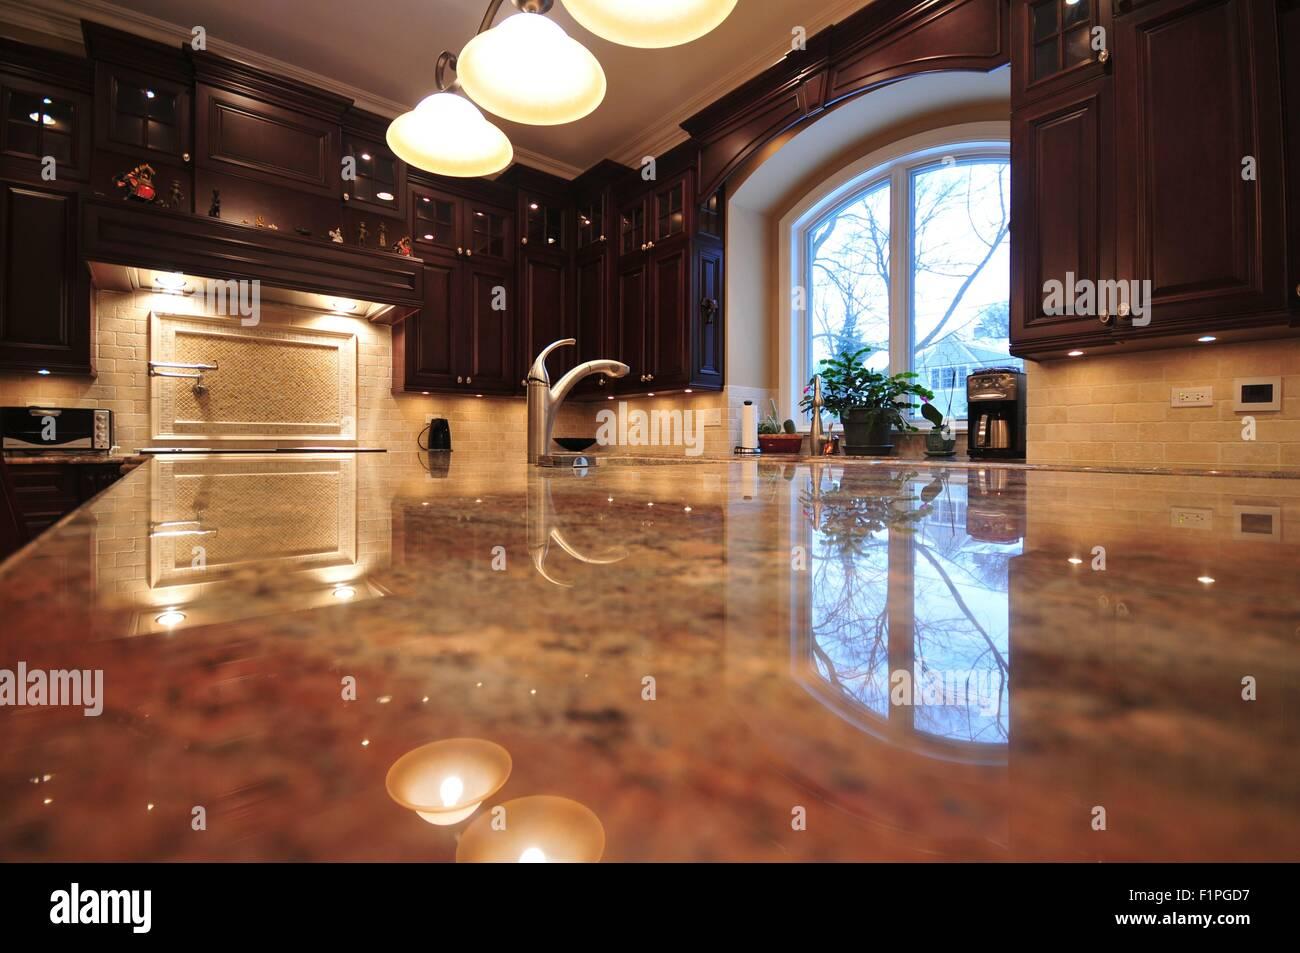 Kitchen Interior. Fancy Kitchen Granite Countertop Stock Photo